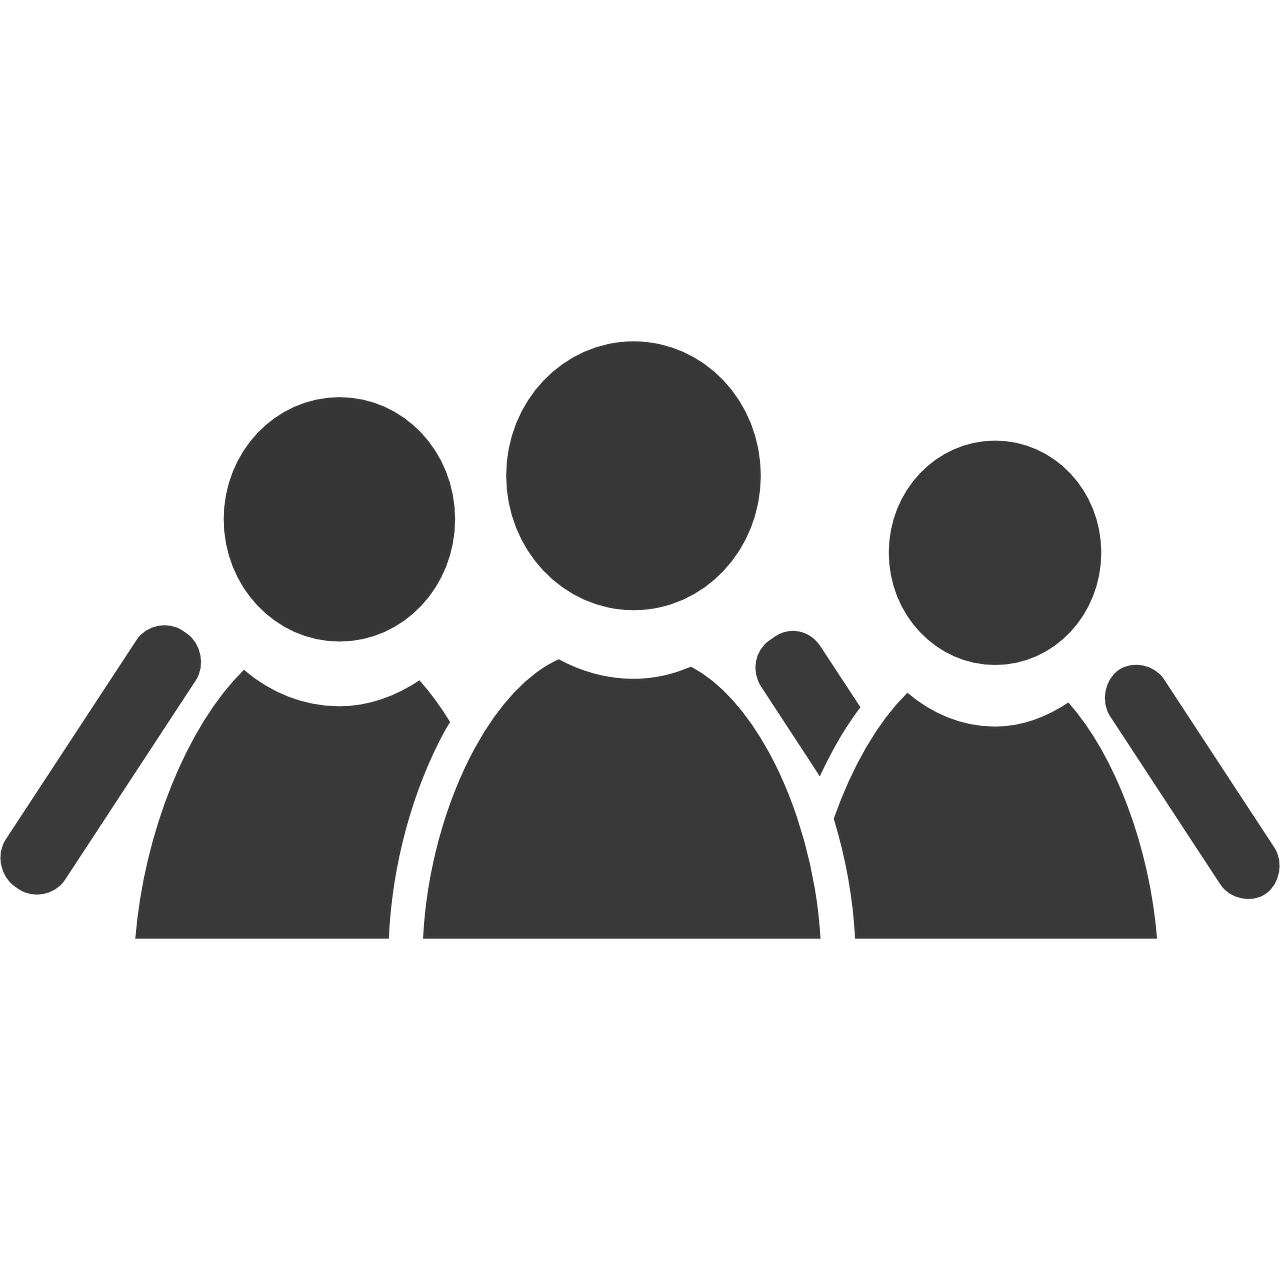 Aktienanalyse-Mitgliedschaft   Bilanzanalyse   Fundamentale Aktienanalyse